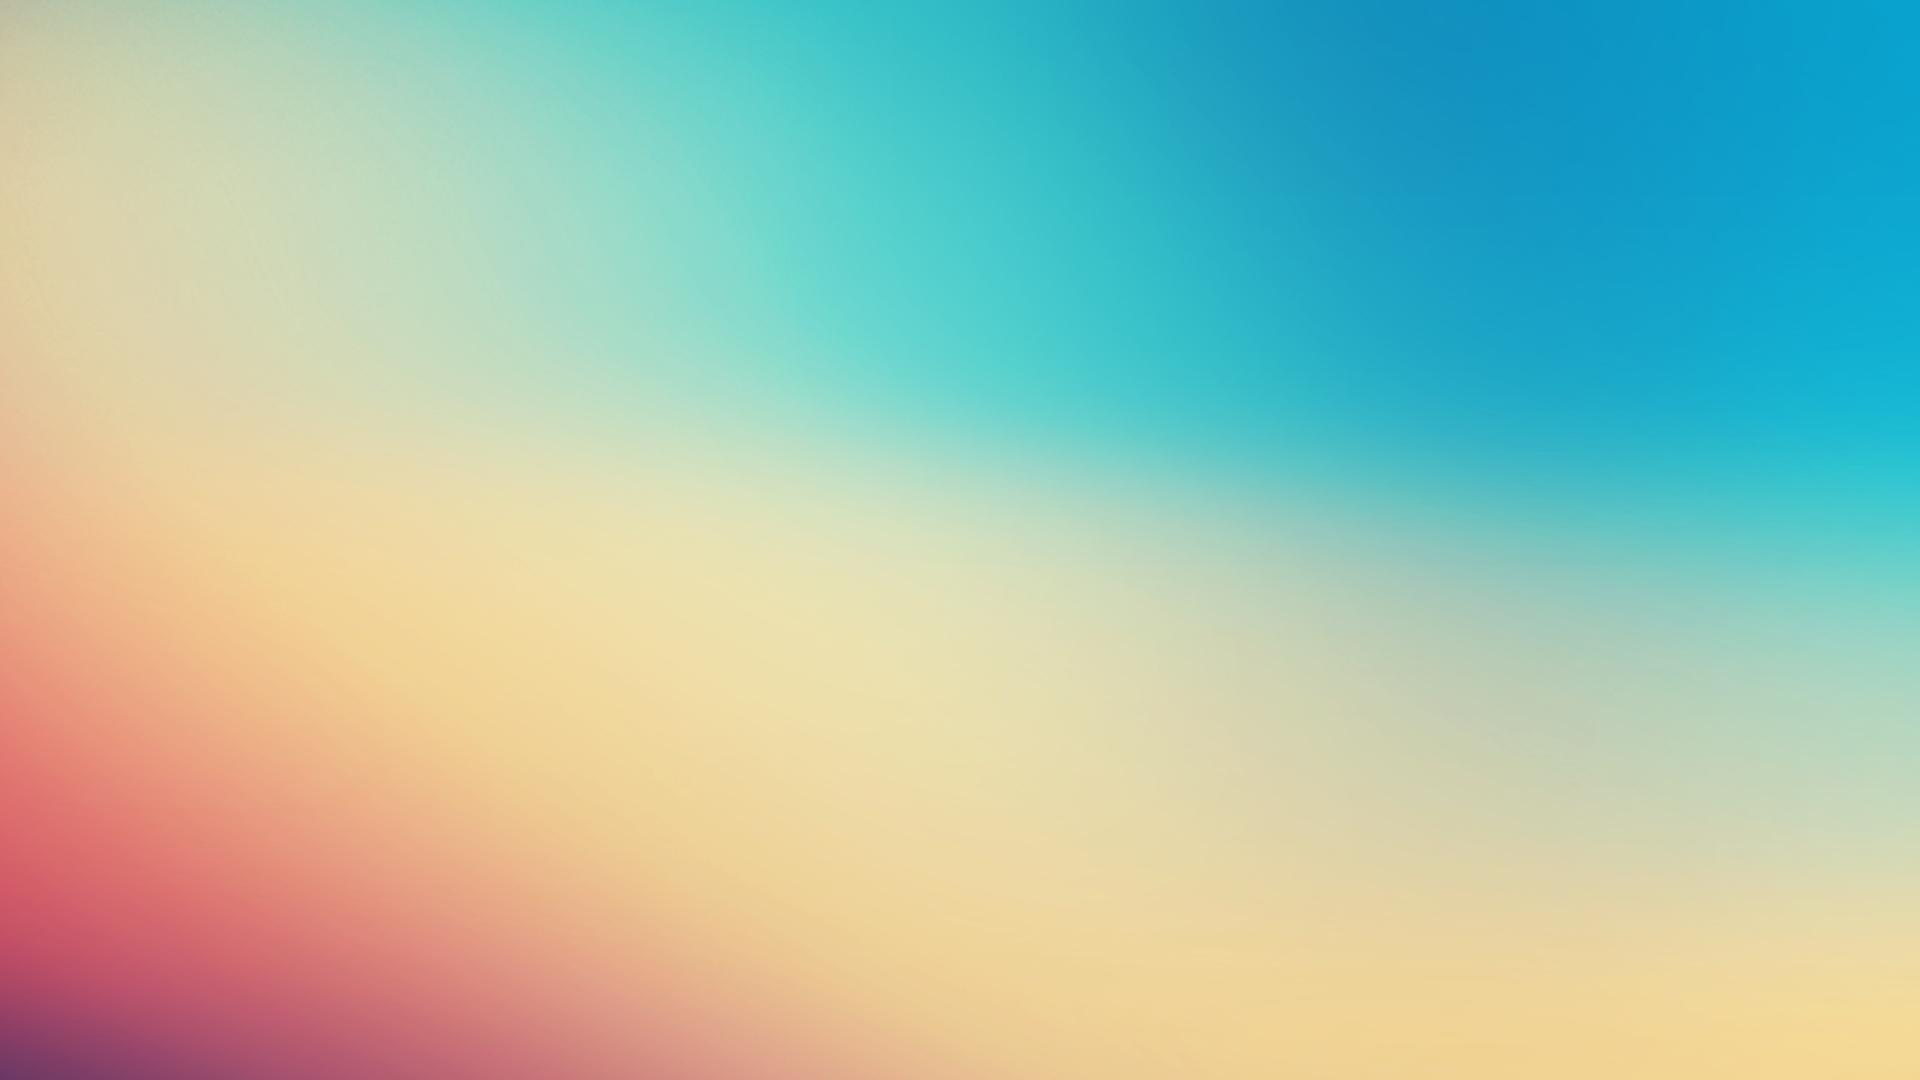 The Funniest And Creative Desktop Wallpaper Design Ideas